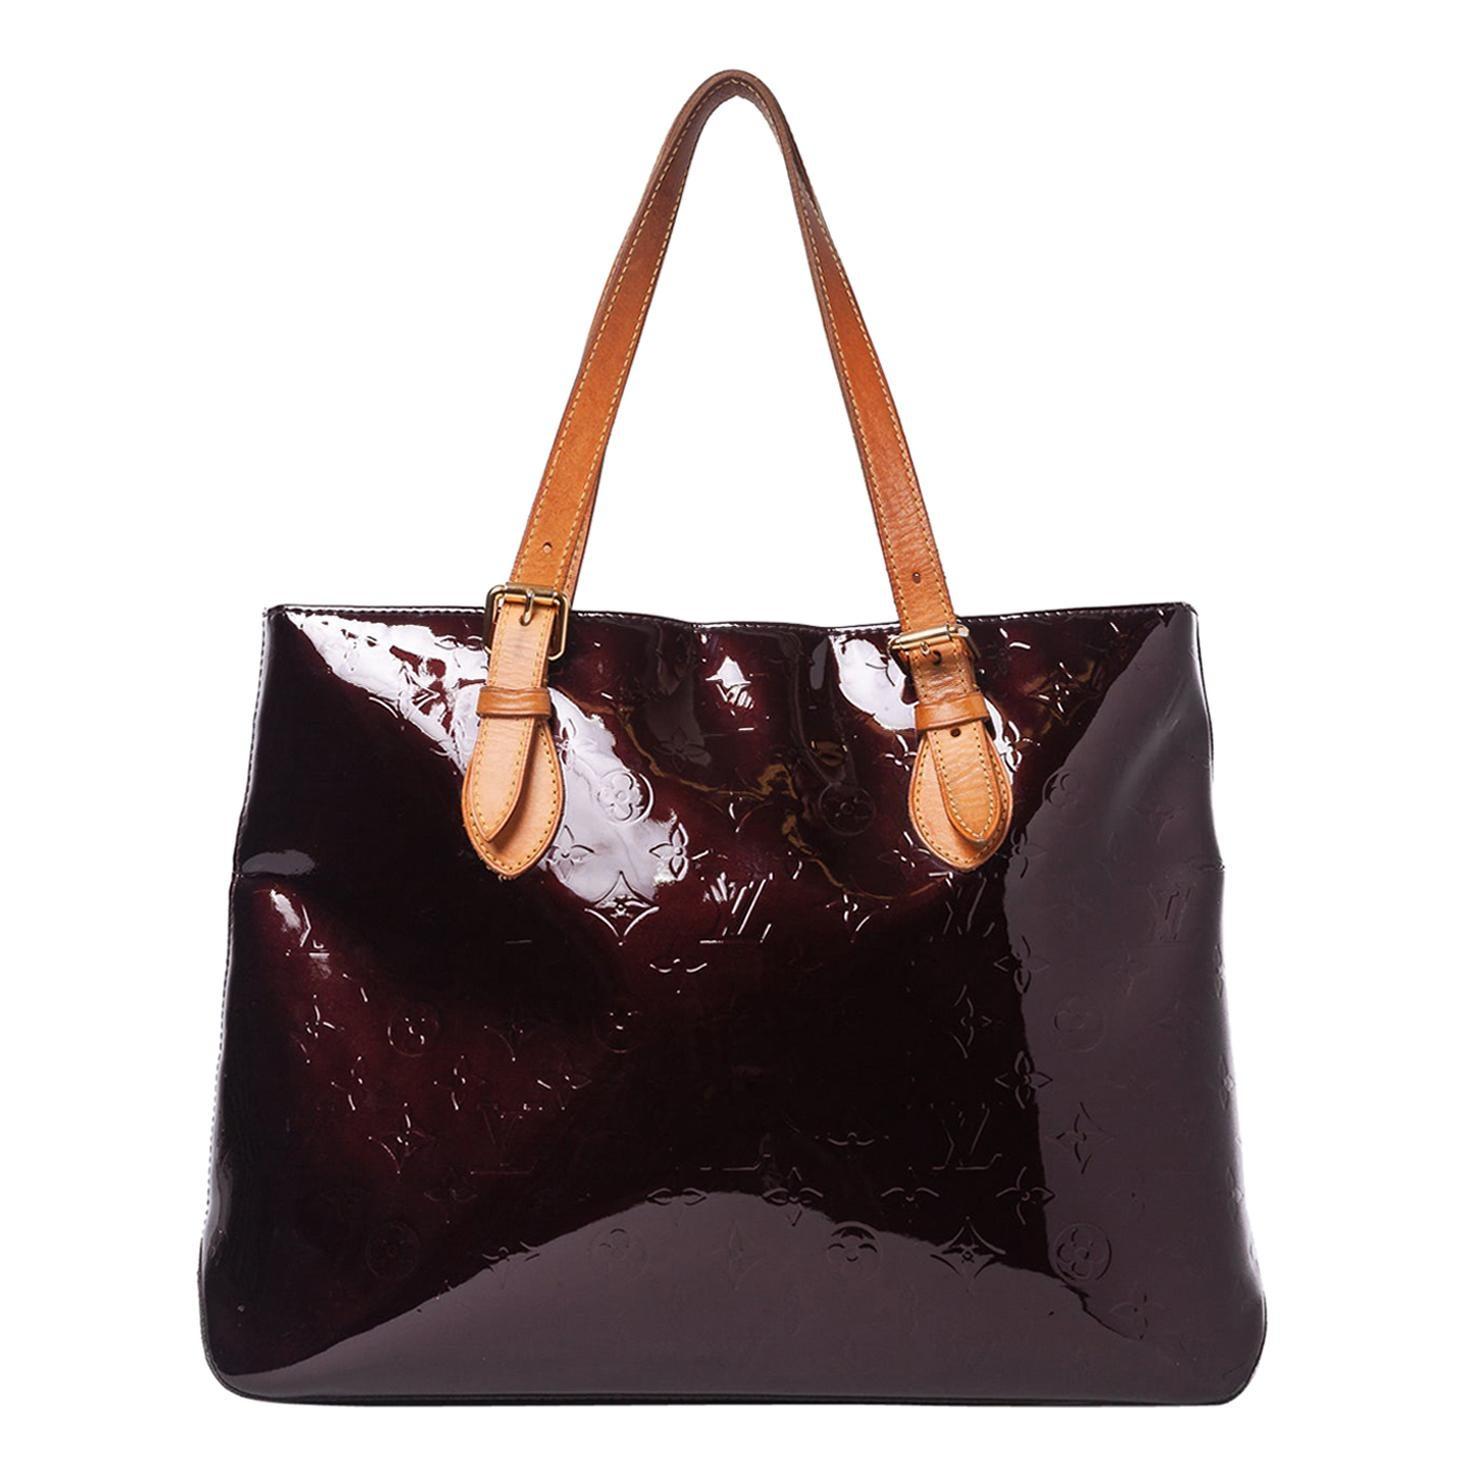 Louis Vuitton Monograma Vernis Brentwood Tote Should Bag